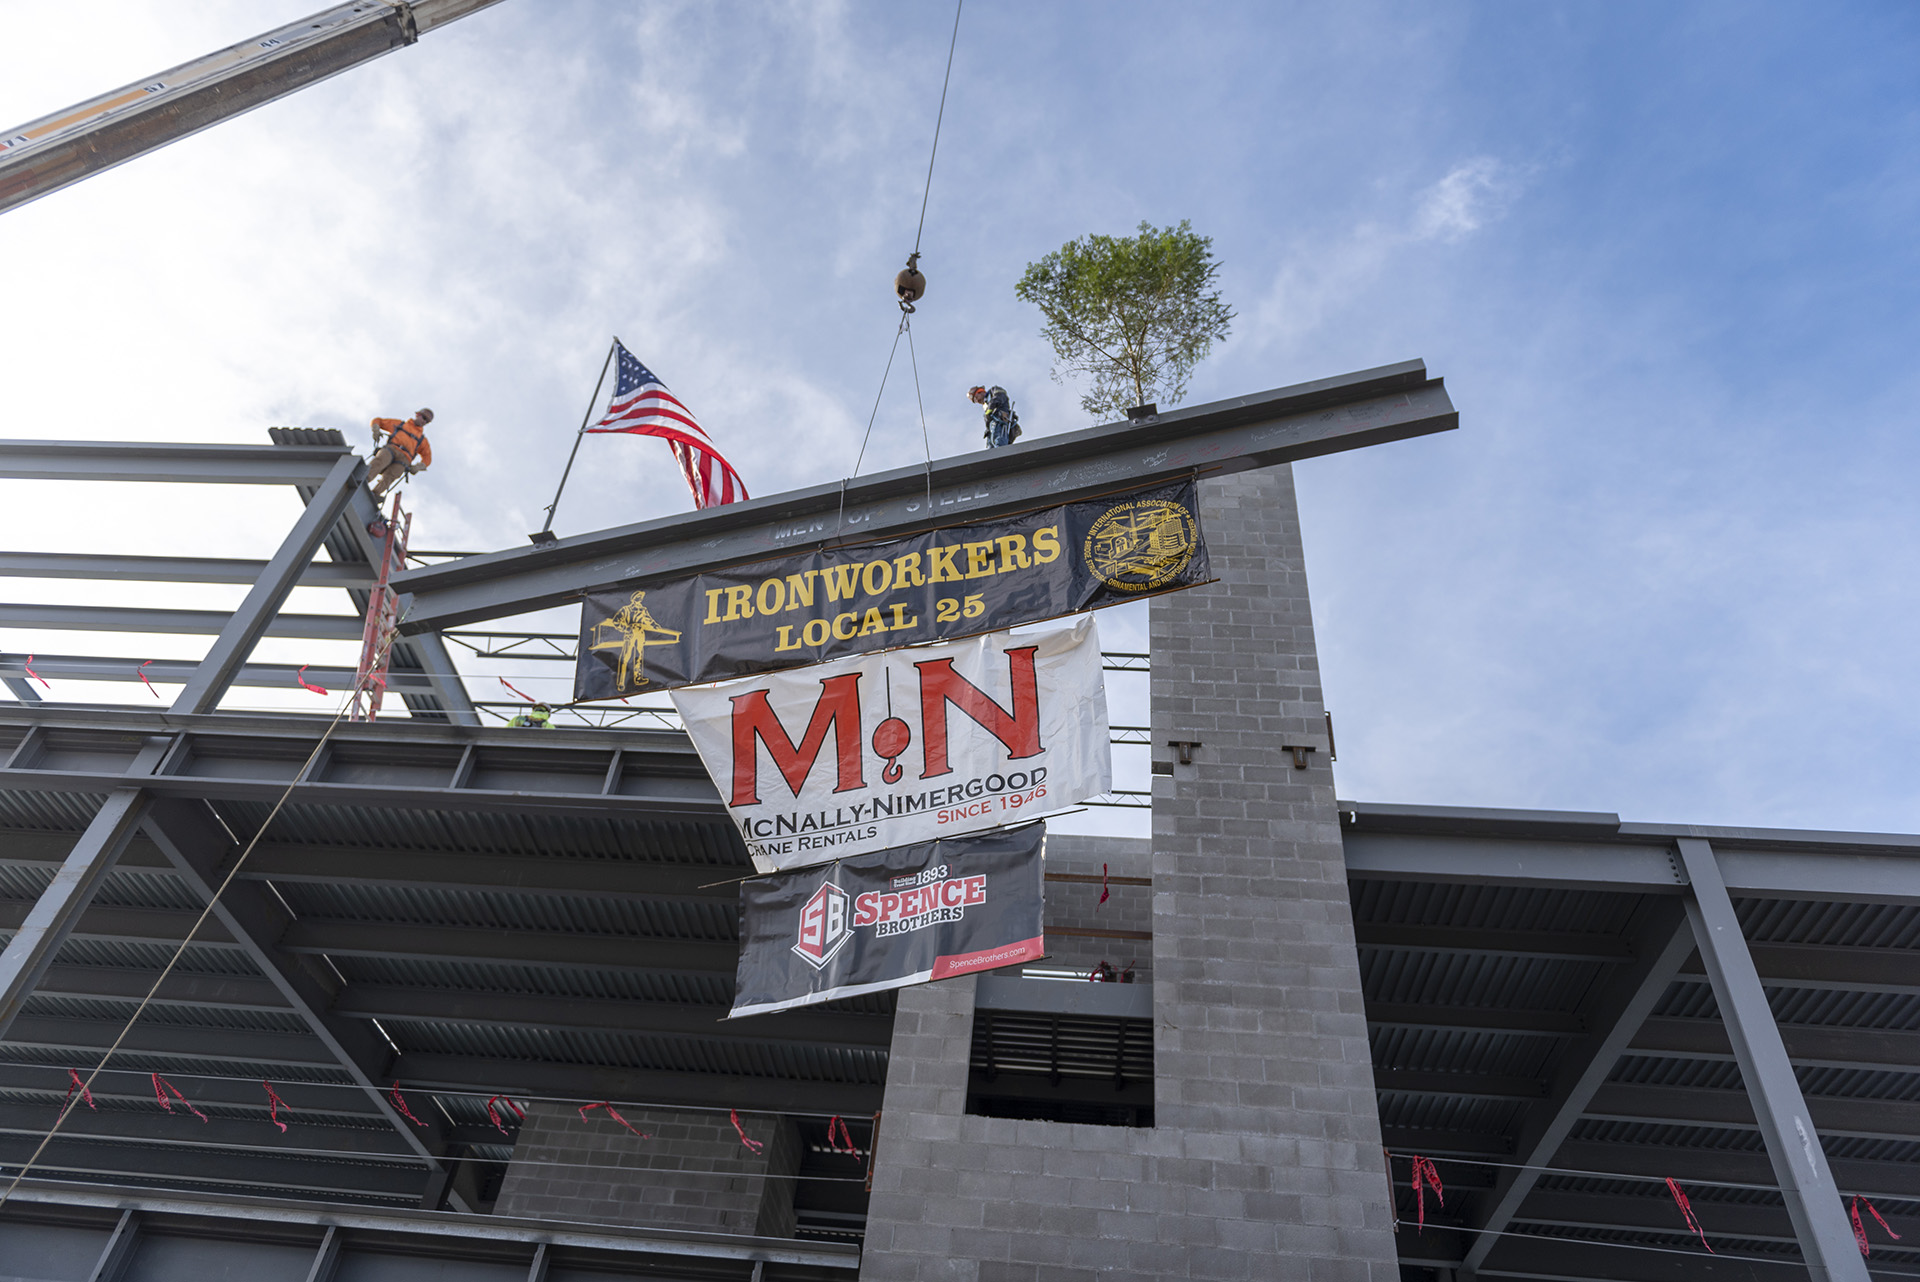 Midland Center final beam